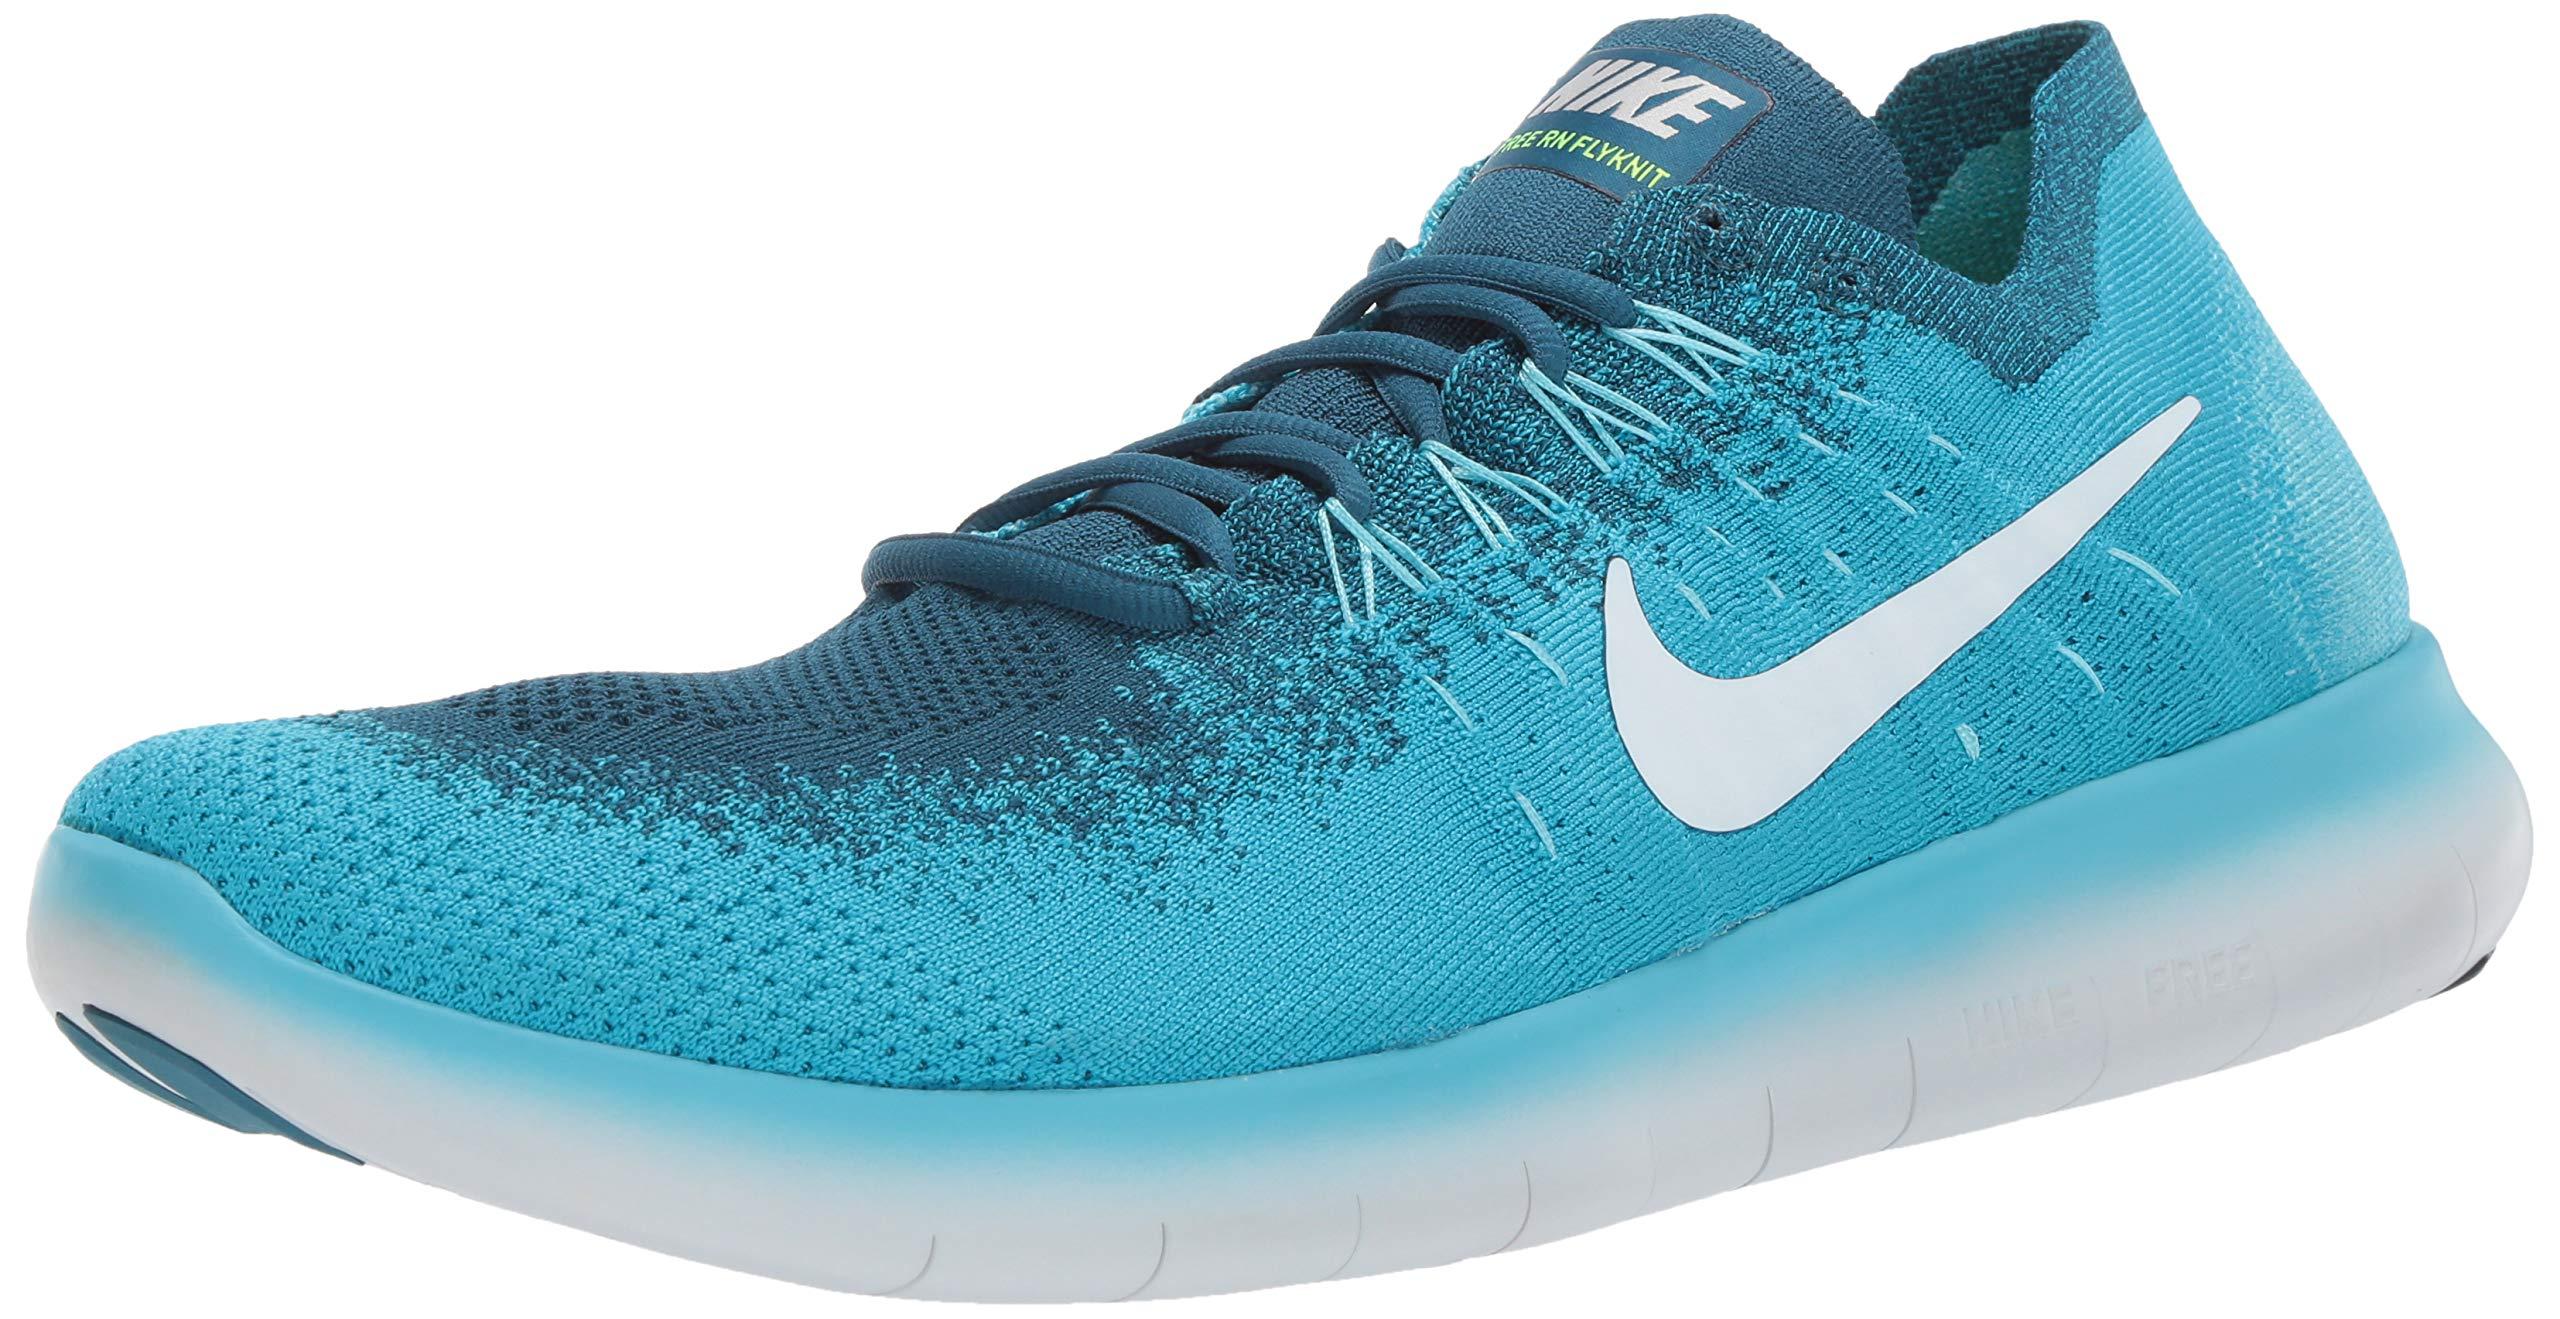 NIKE Free RN Flyknit 2017 SZ 9.5 Mens Running Blue LagoonPure Platinum Legend Blue Shoes